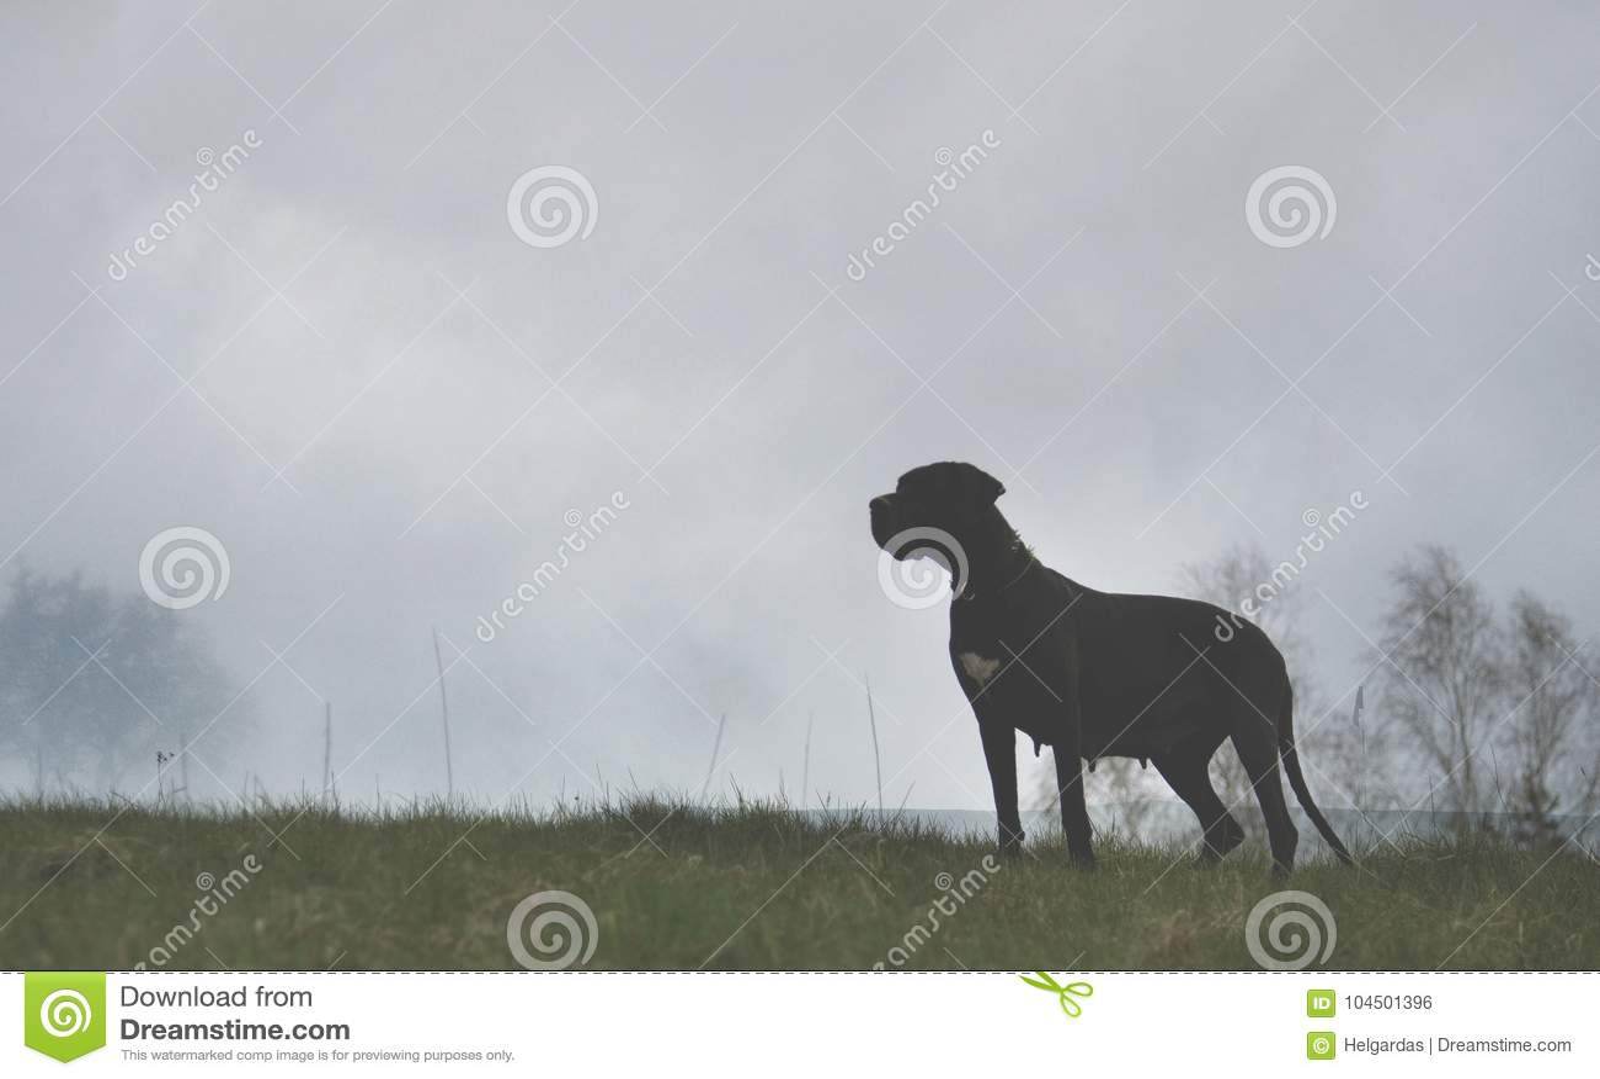 Download Dog on misty background stock photo. Image of mist, background - 104501396